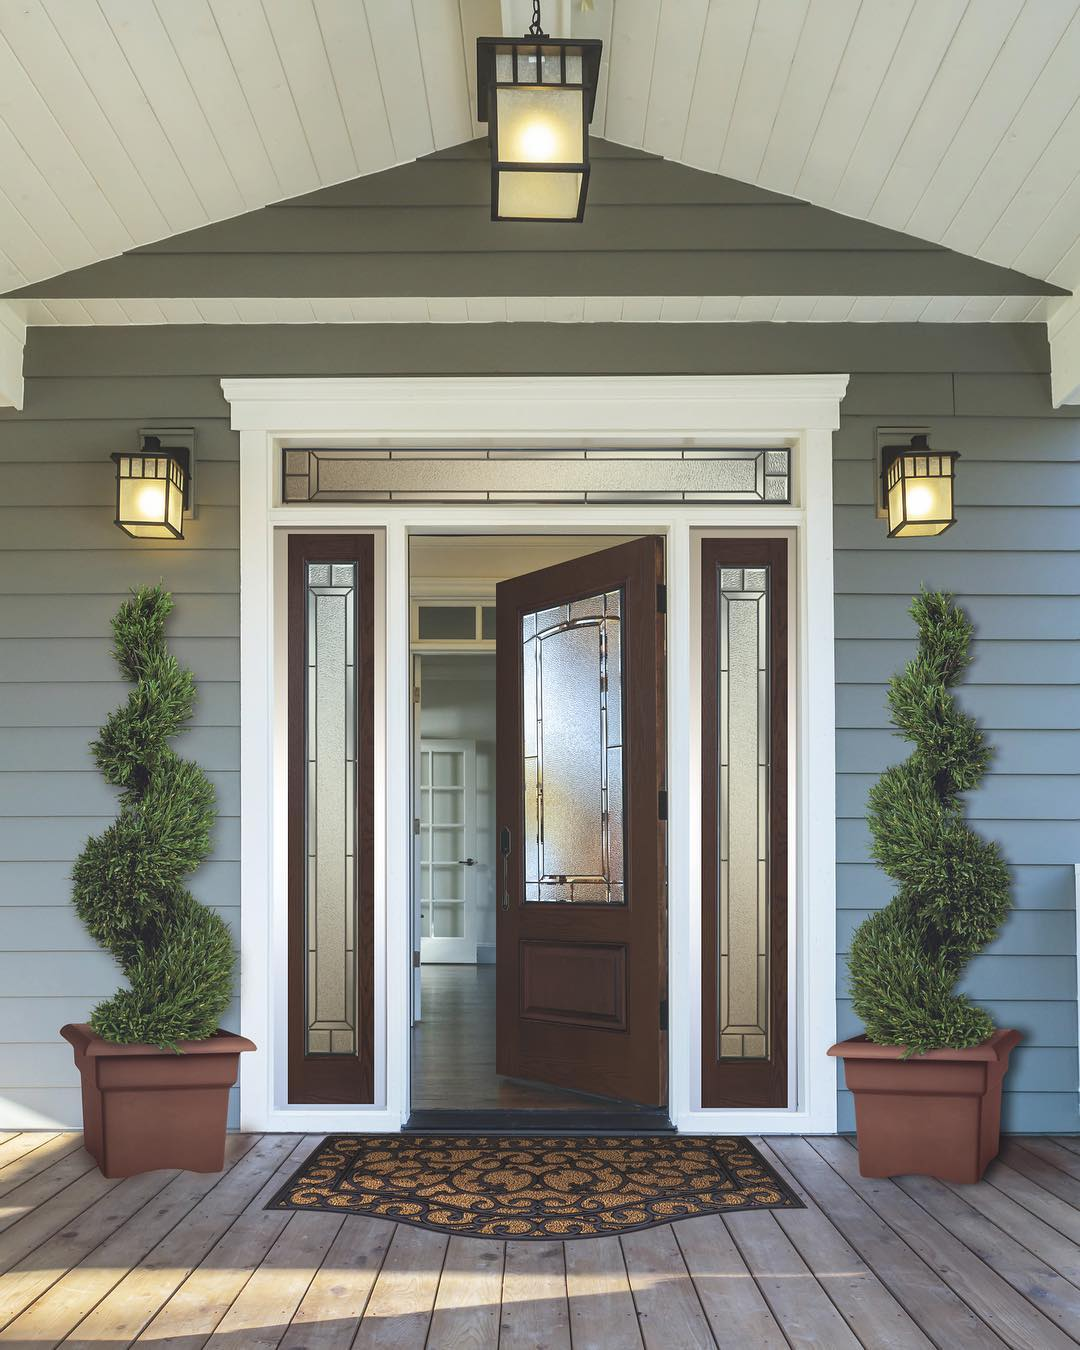 Picture of a front door